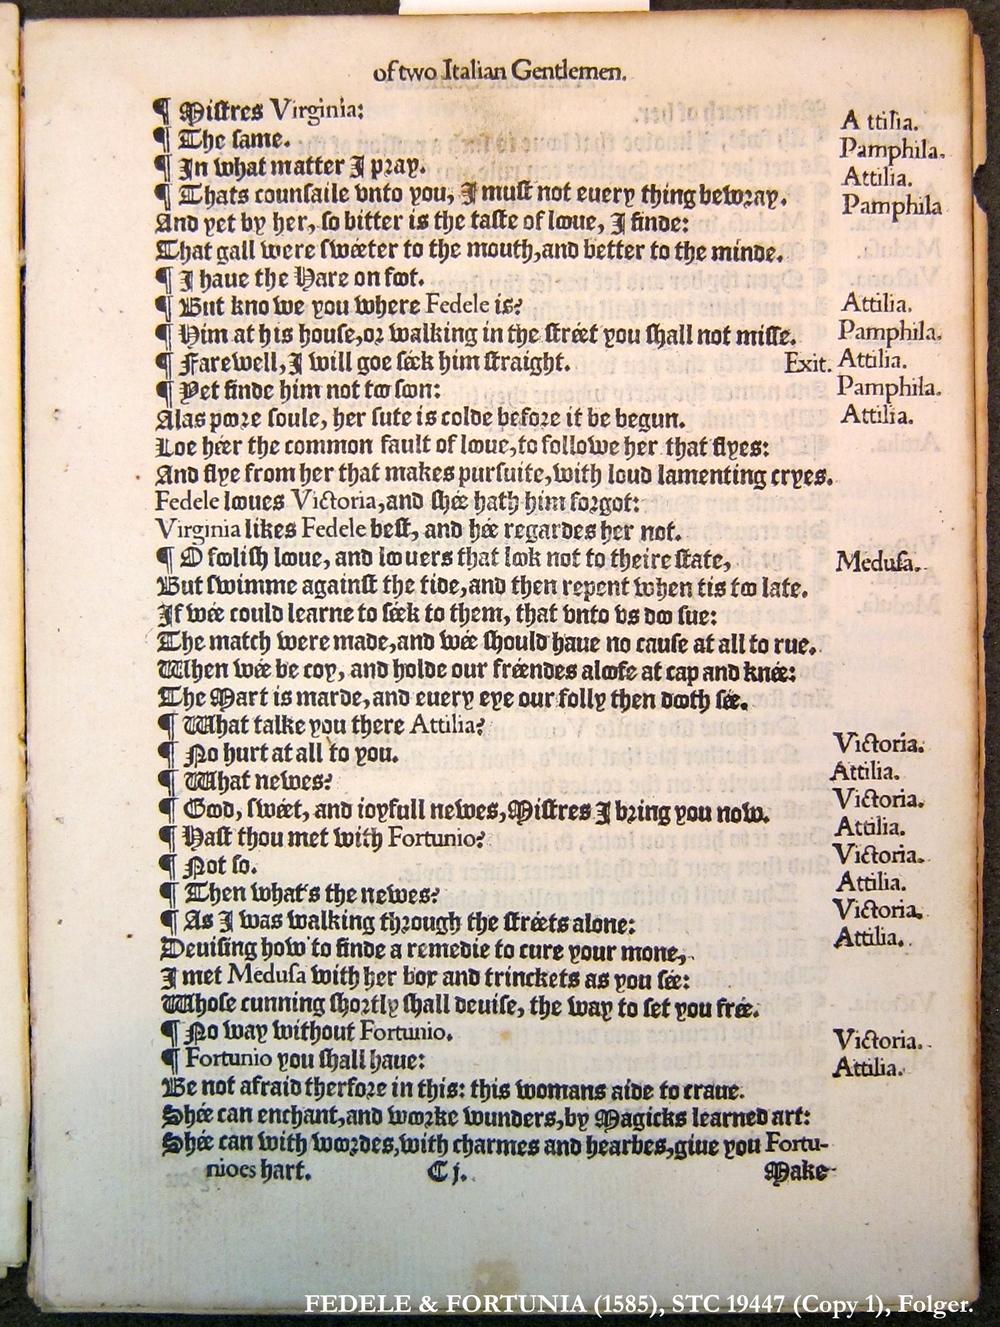 Fedele & Fortunia (1585), STC 19447 (Copy 1), Folger.